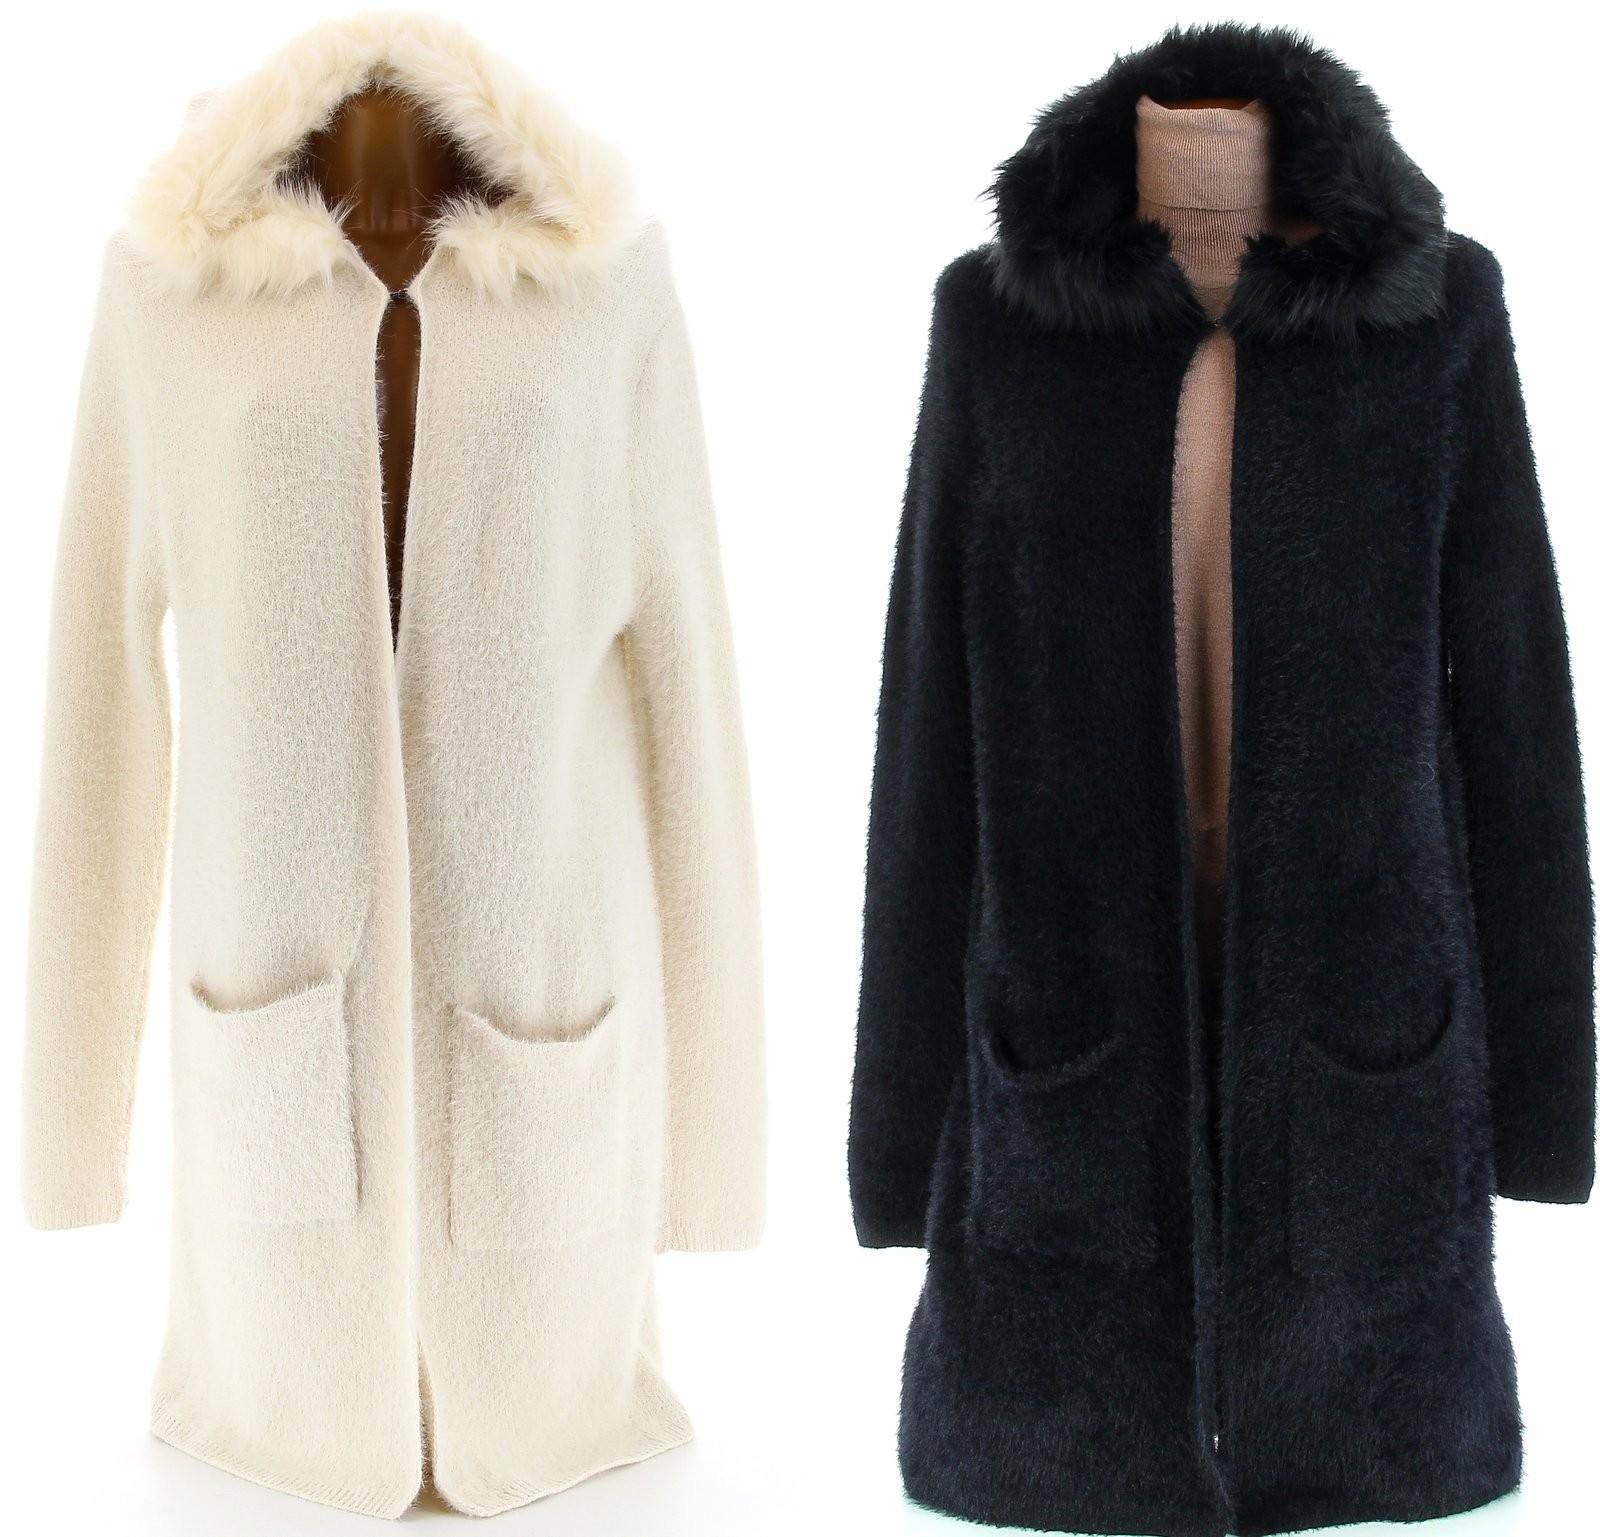 Manteau grosse maille laine femme